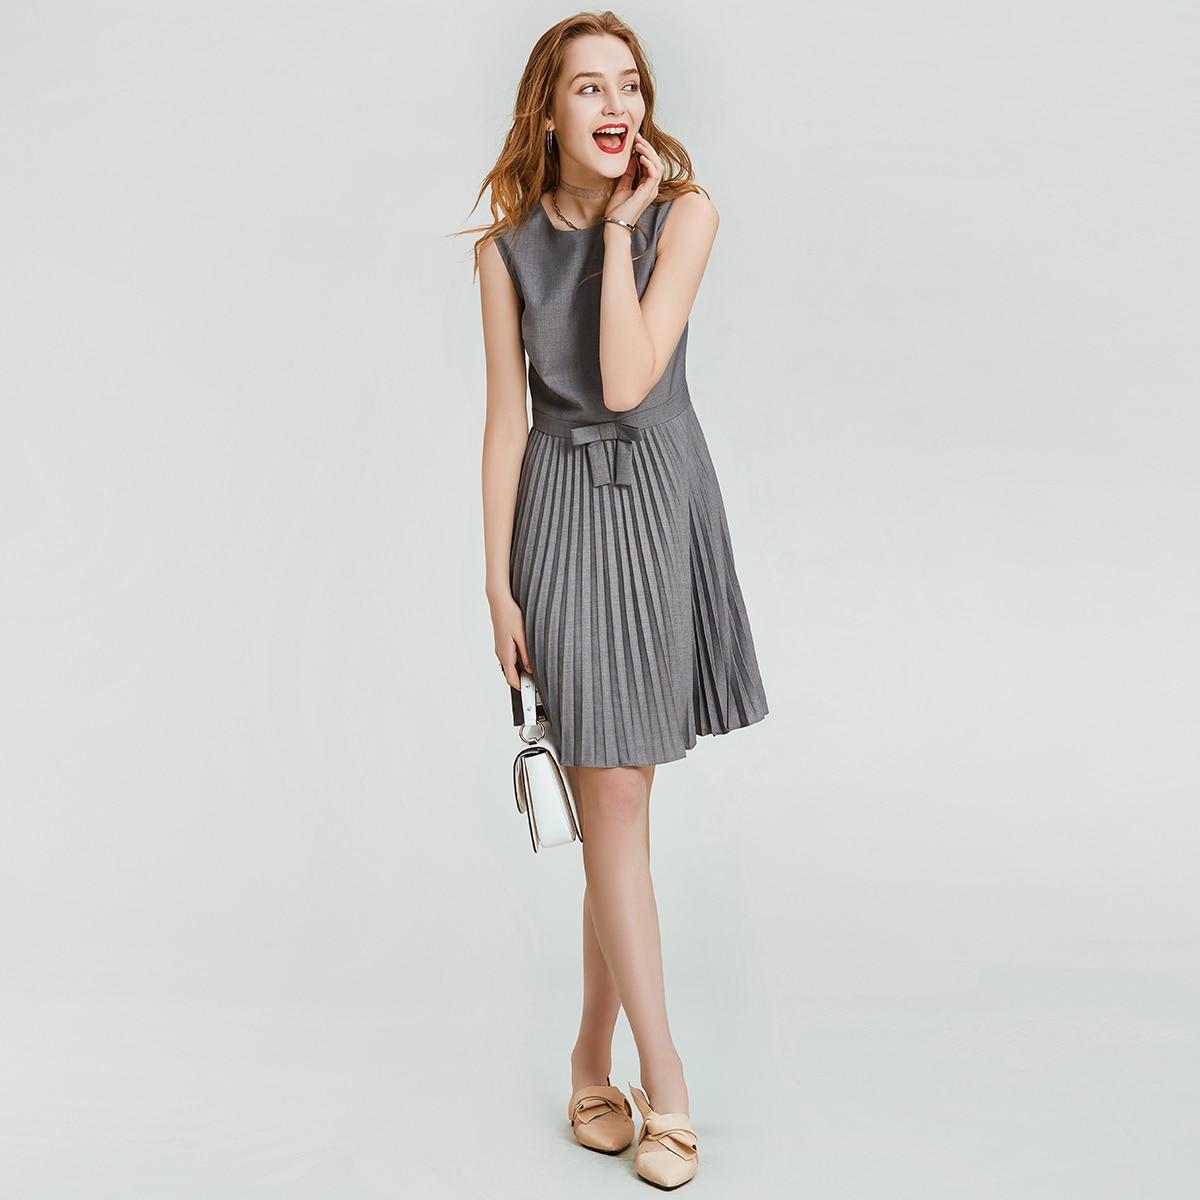 HAVVA Early Spring Women Pure Gray Sleeveless Dress Cool Style Slim Organ Pleated A line Summer Dress Q3338 - 5